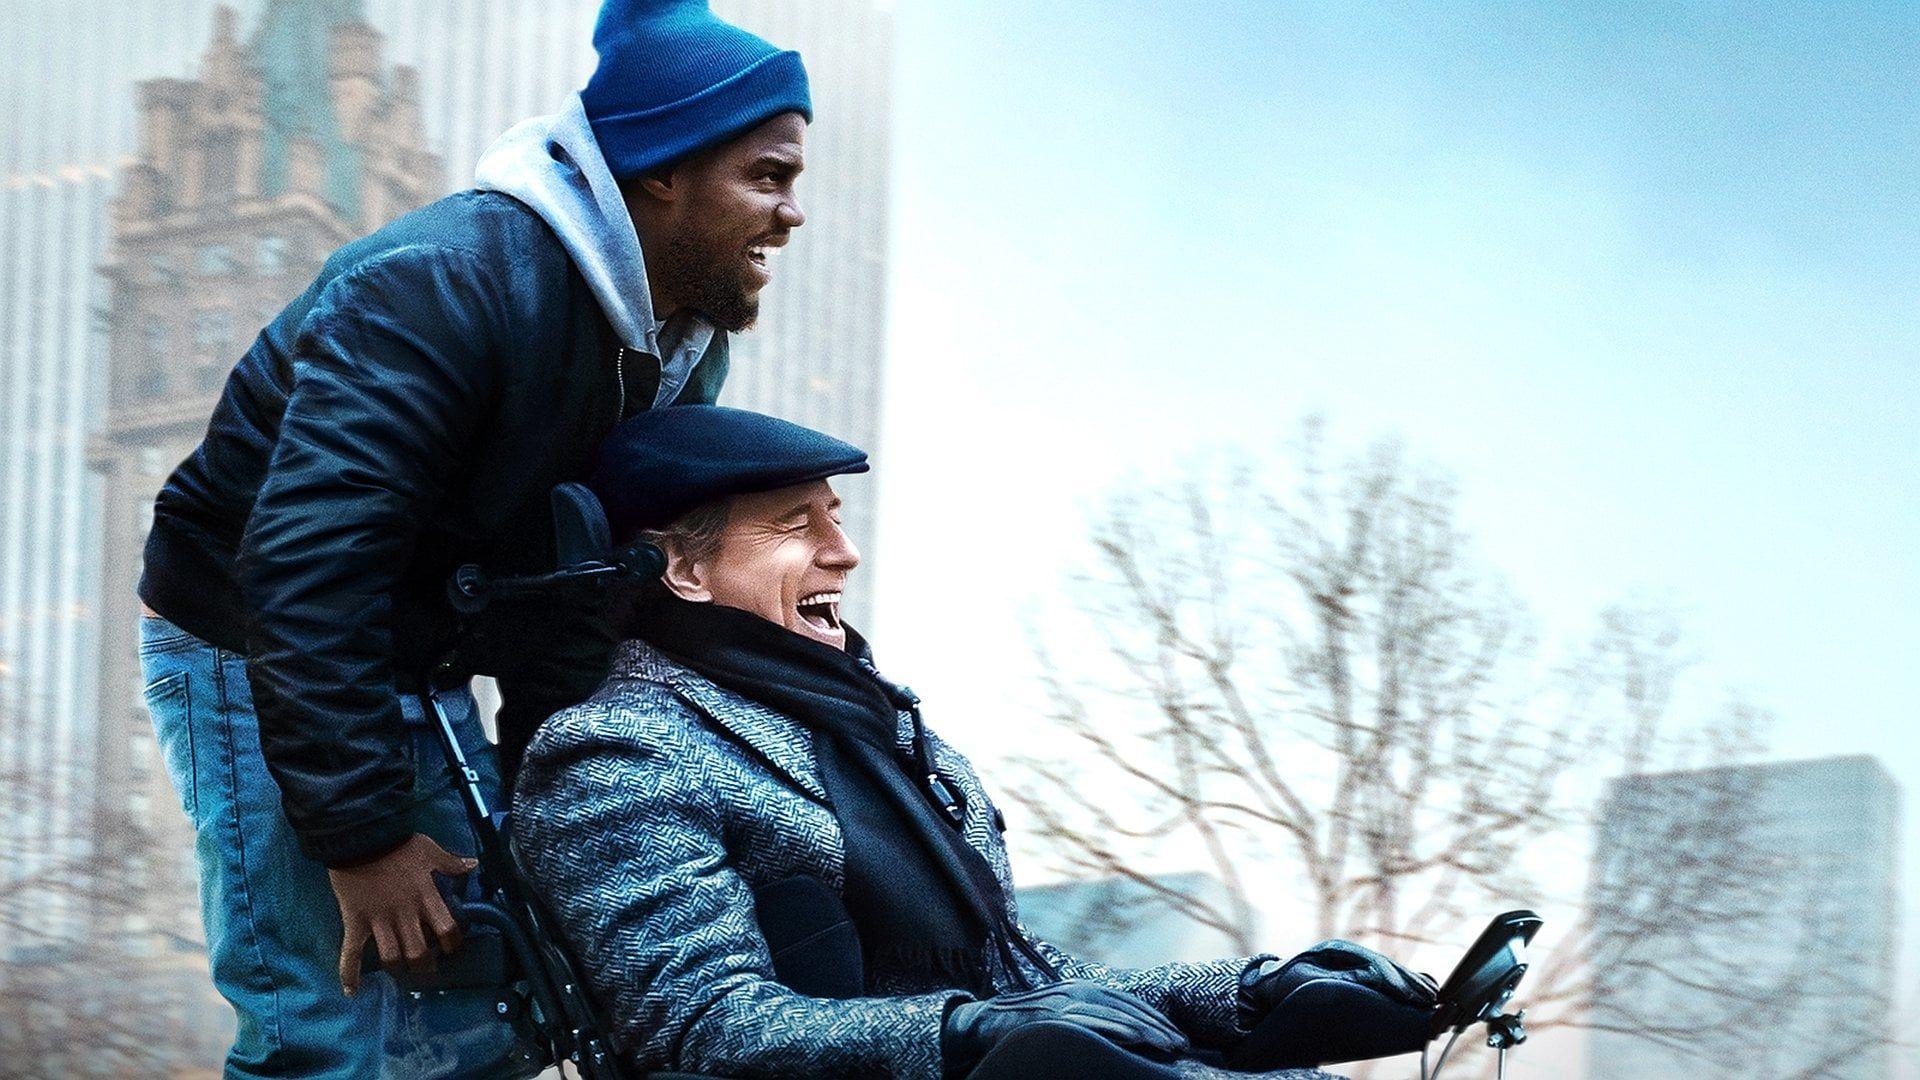 The Upside 2019 ONLINE TELJES FILM FILMEK MAGYARUL